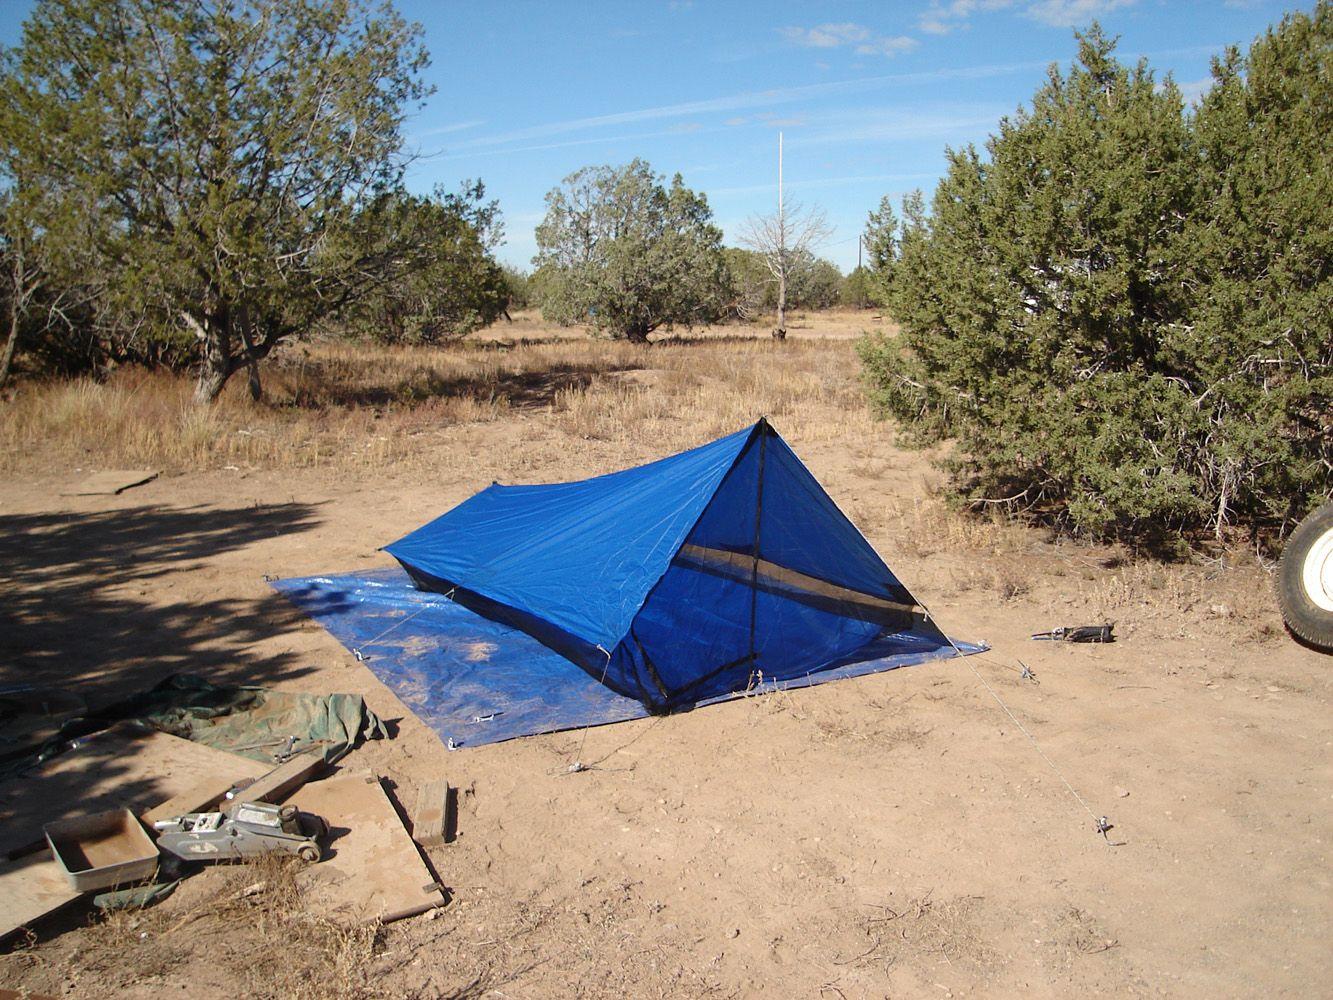 Diy Tent Diy Tarp Tent Plans Stuff To Buy Pinterest Tents